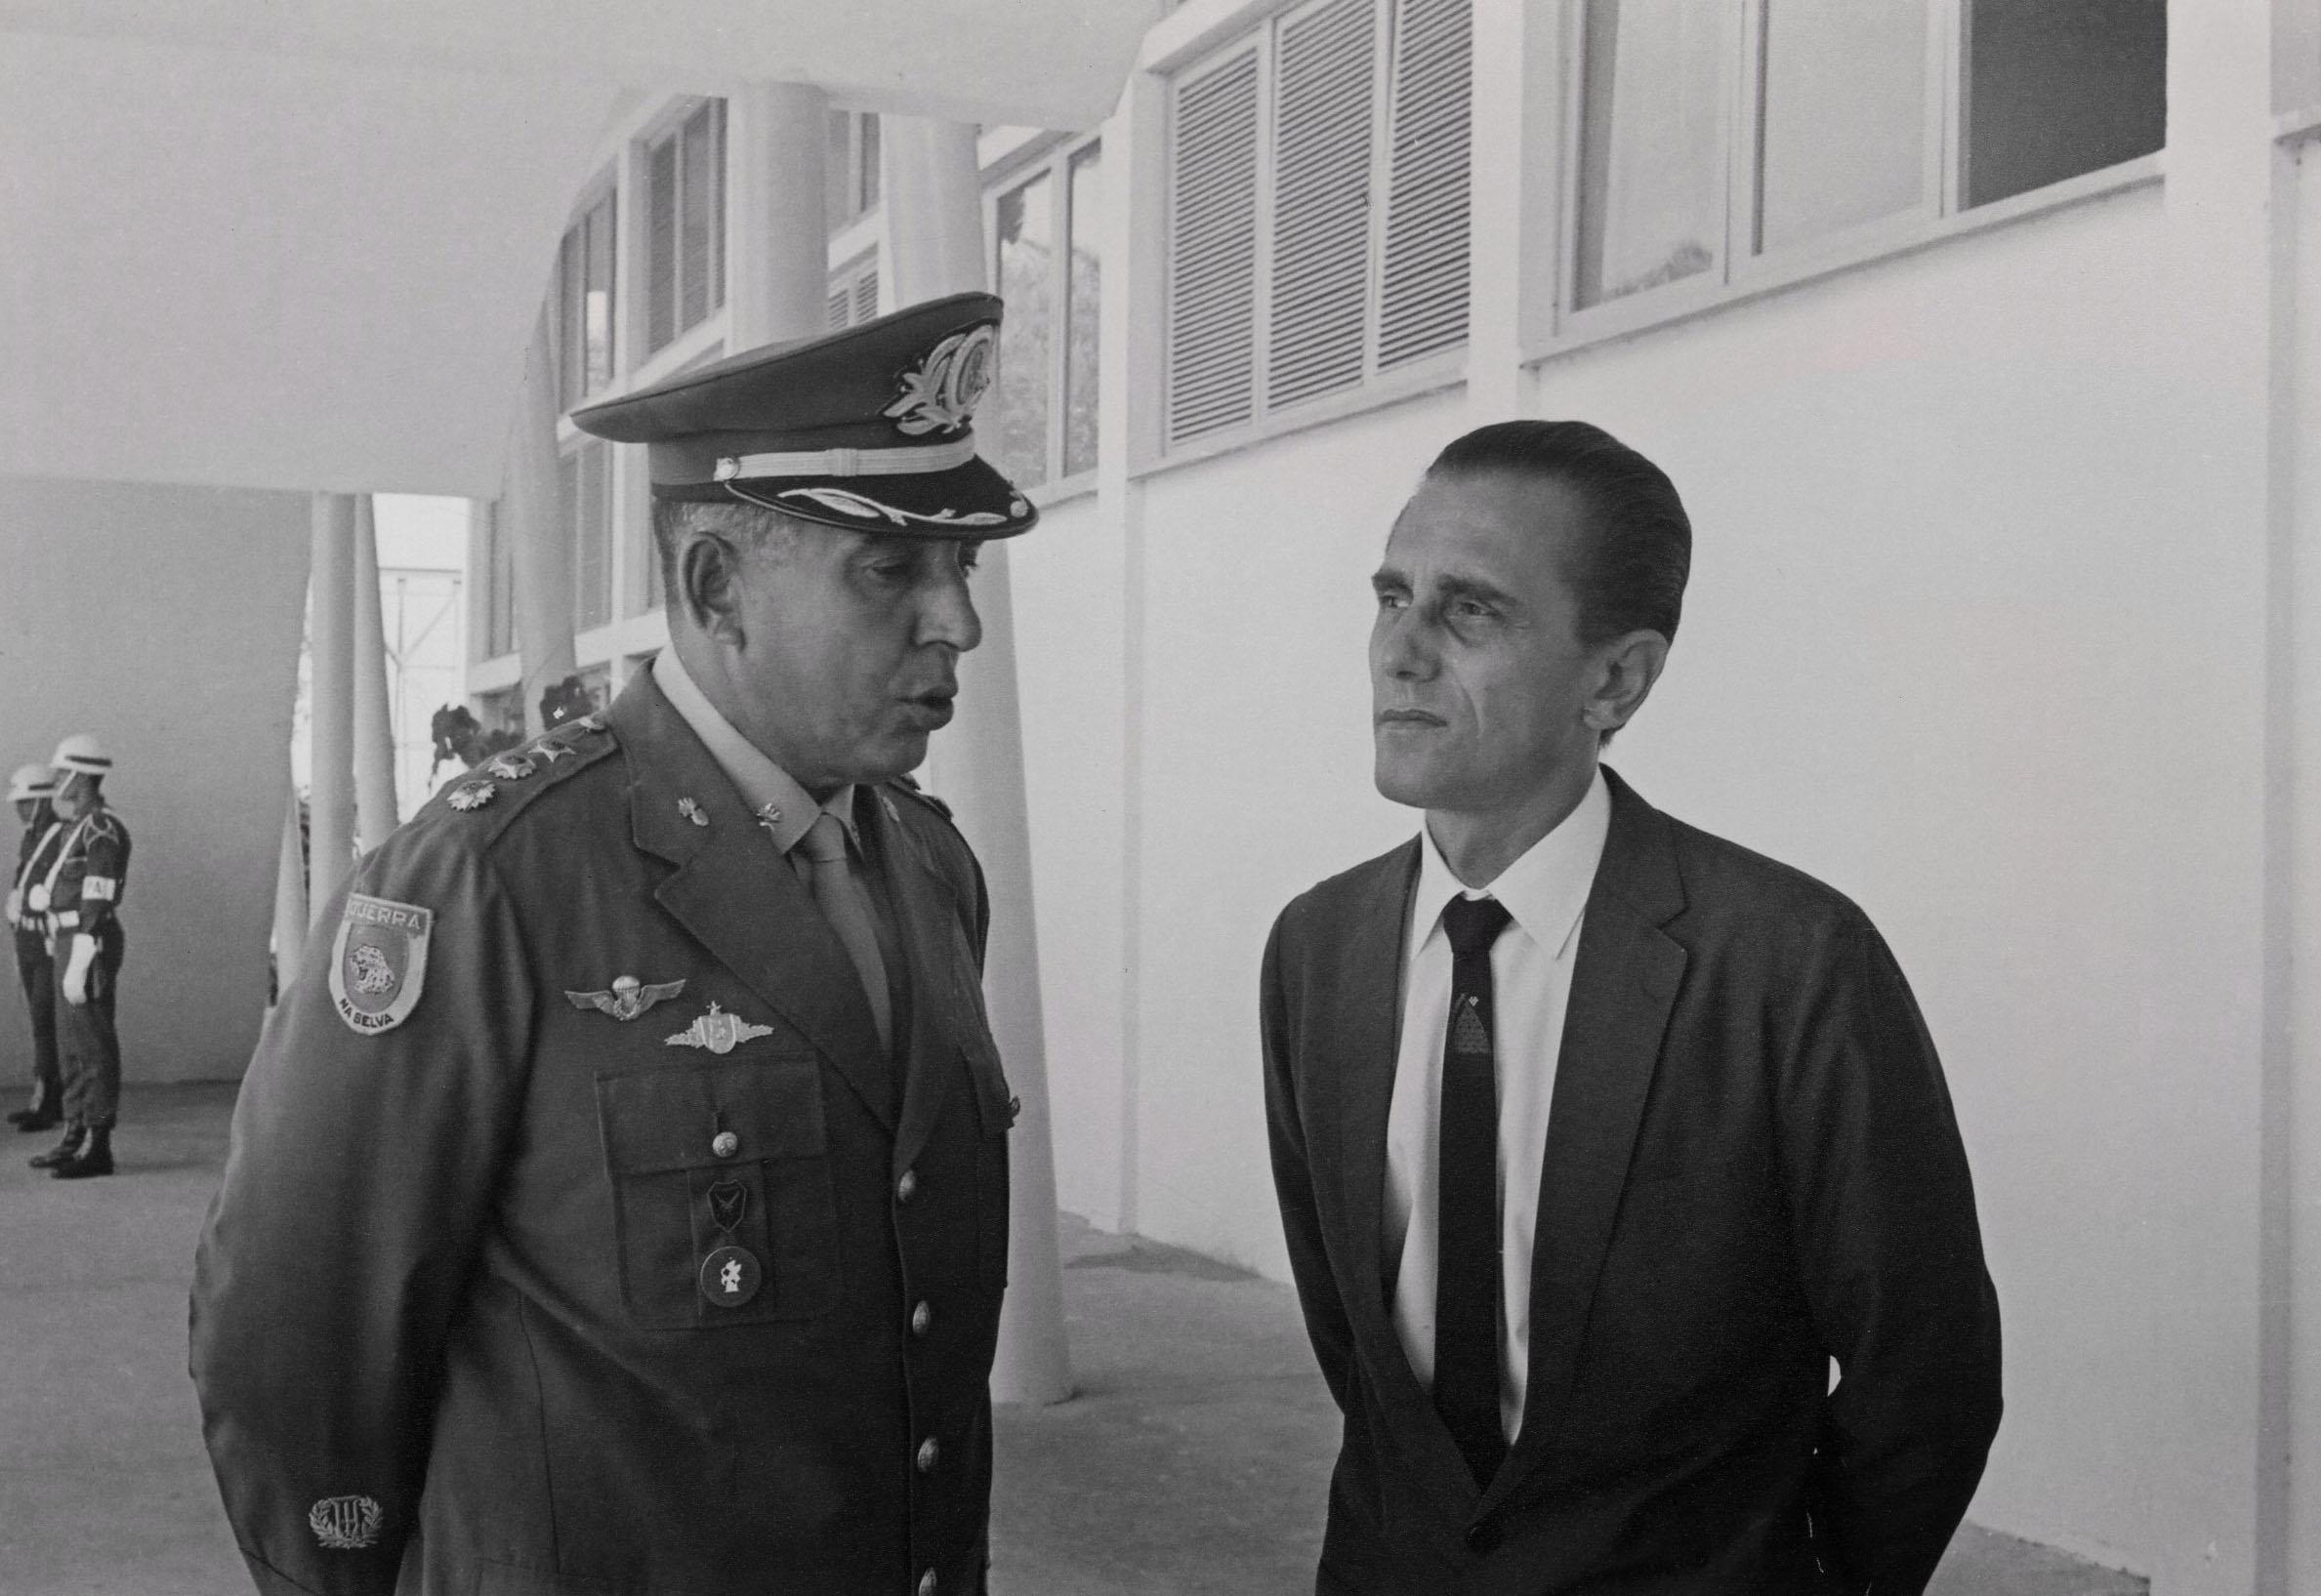 Coronel Jorge Teixeira no DERAM - Instituto Durango Duarte